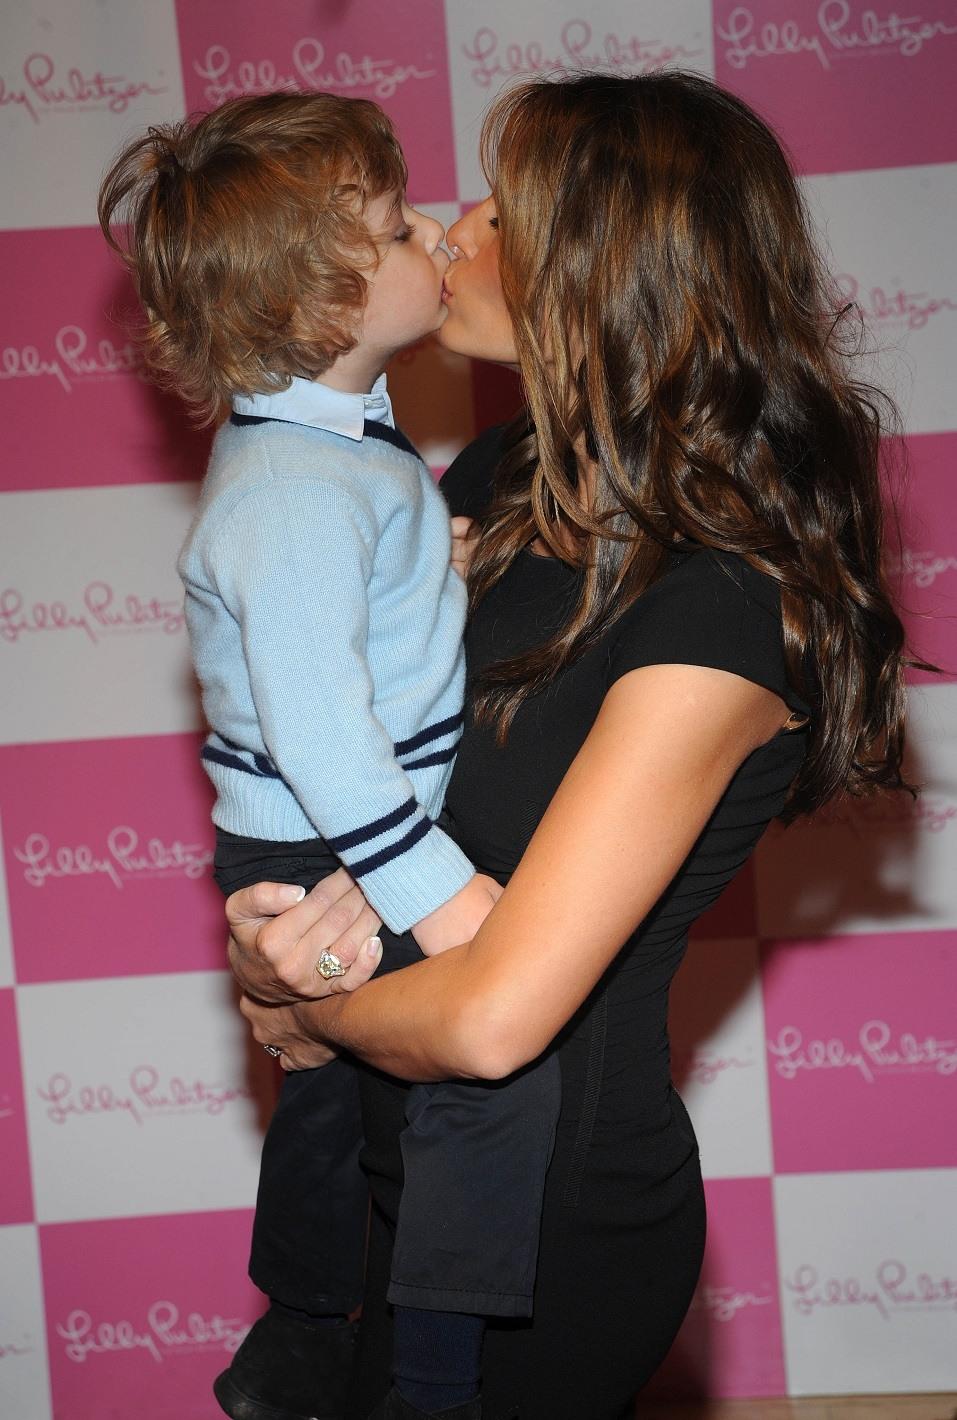 Melania Trump with her son Barron Trump